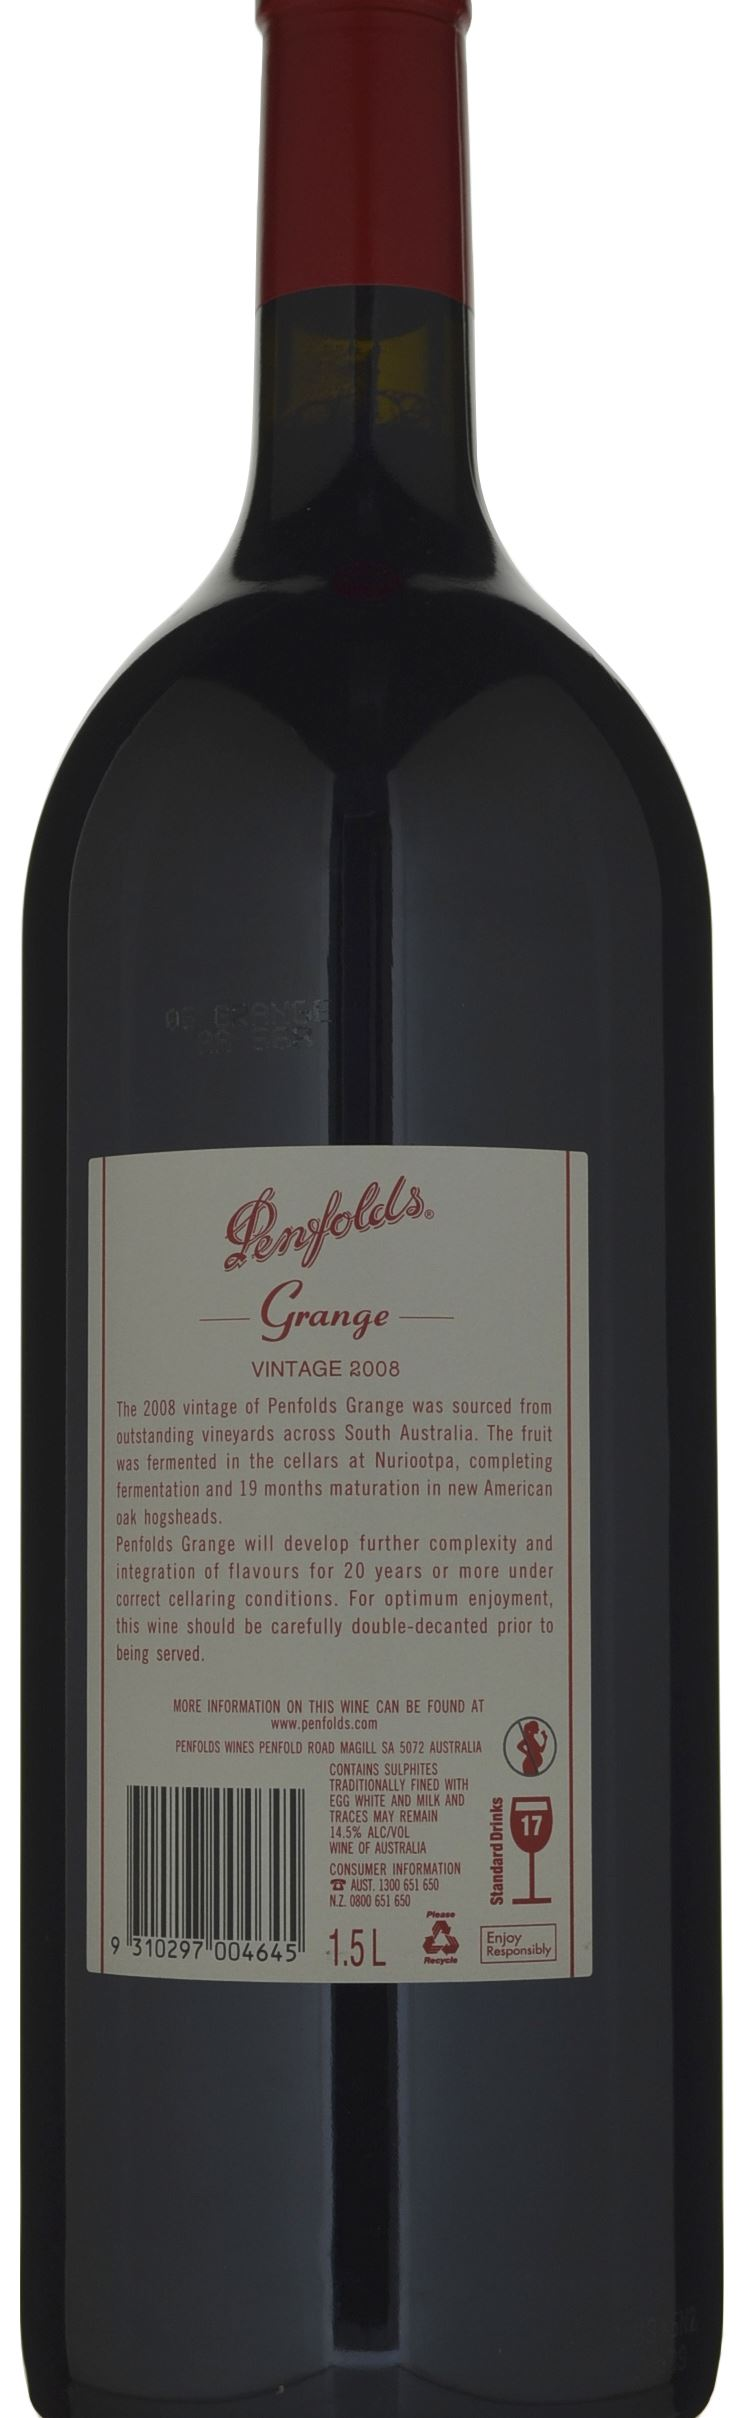 Penfolds Grange 2008 2 499 00 100pts Cellarit Wine Storage